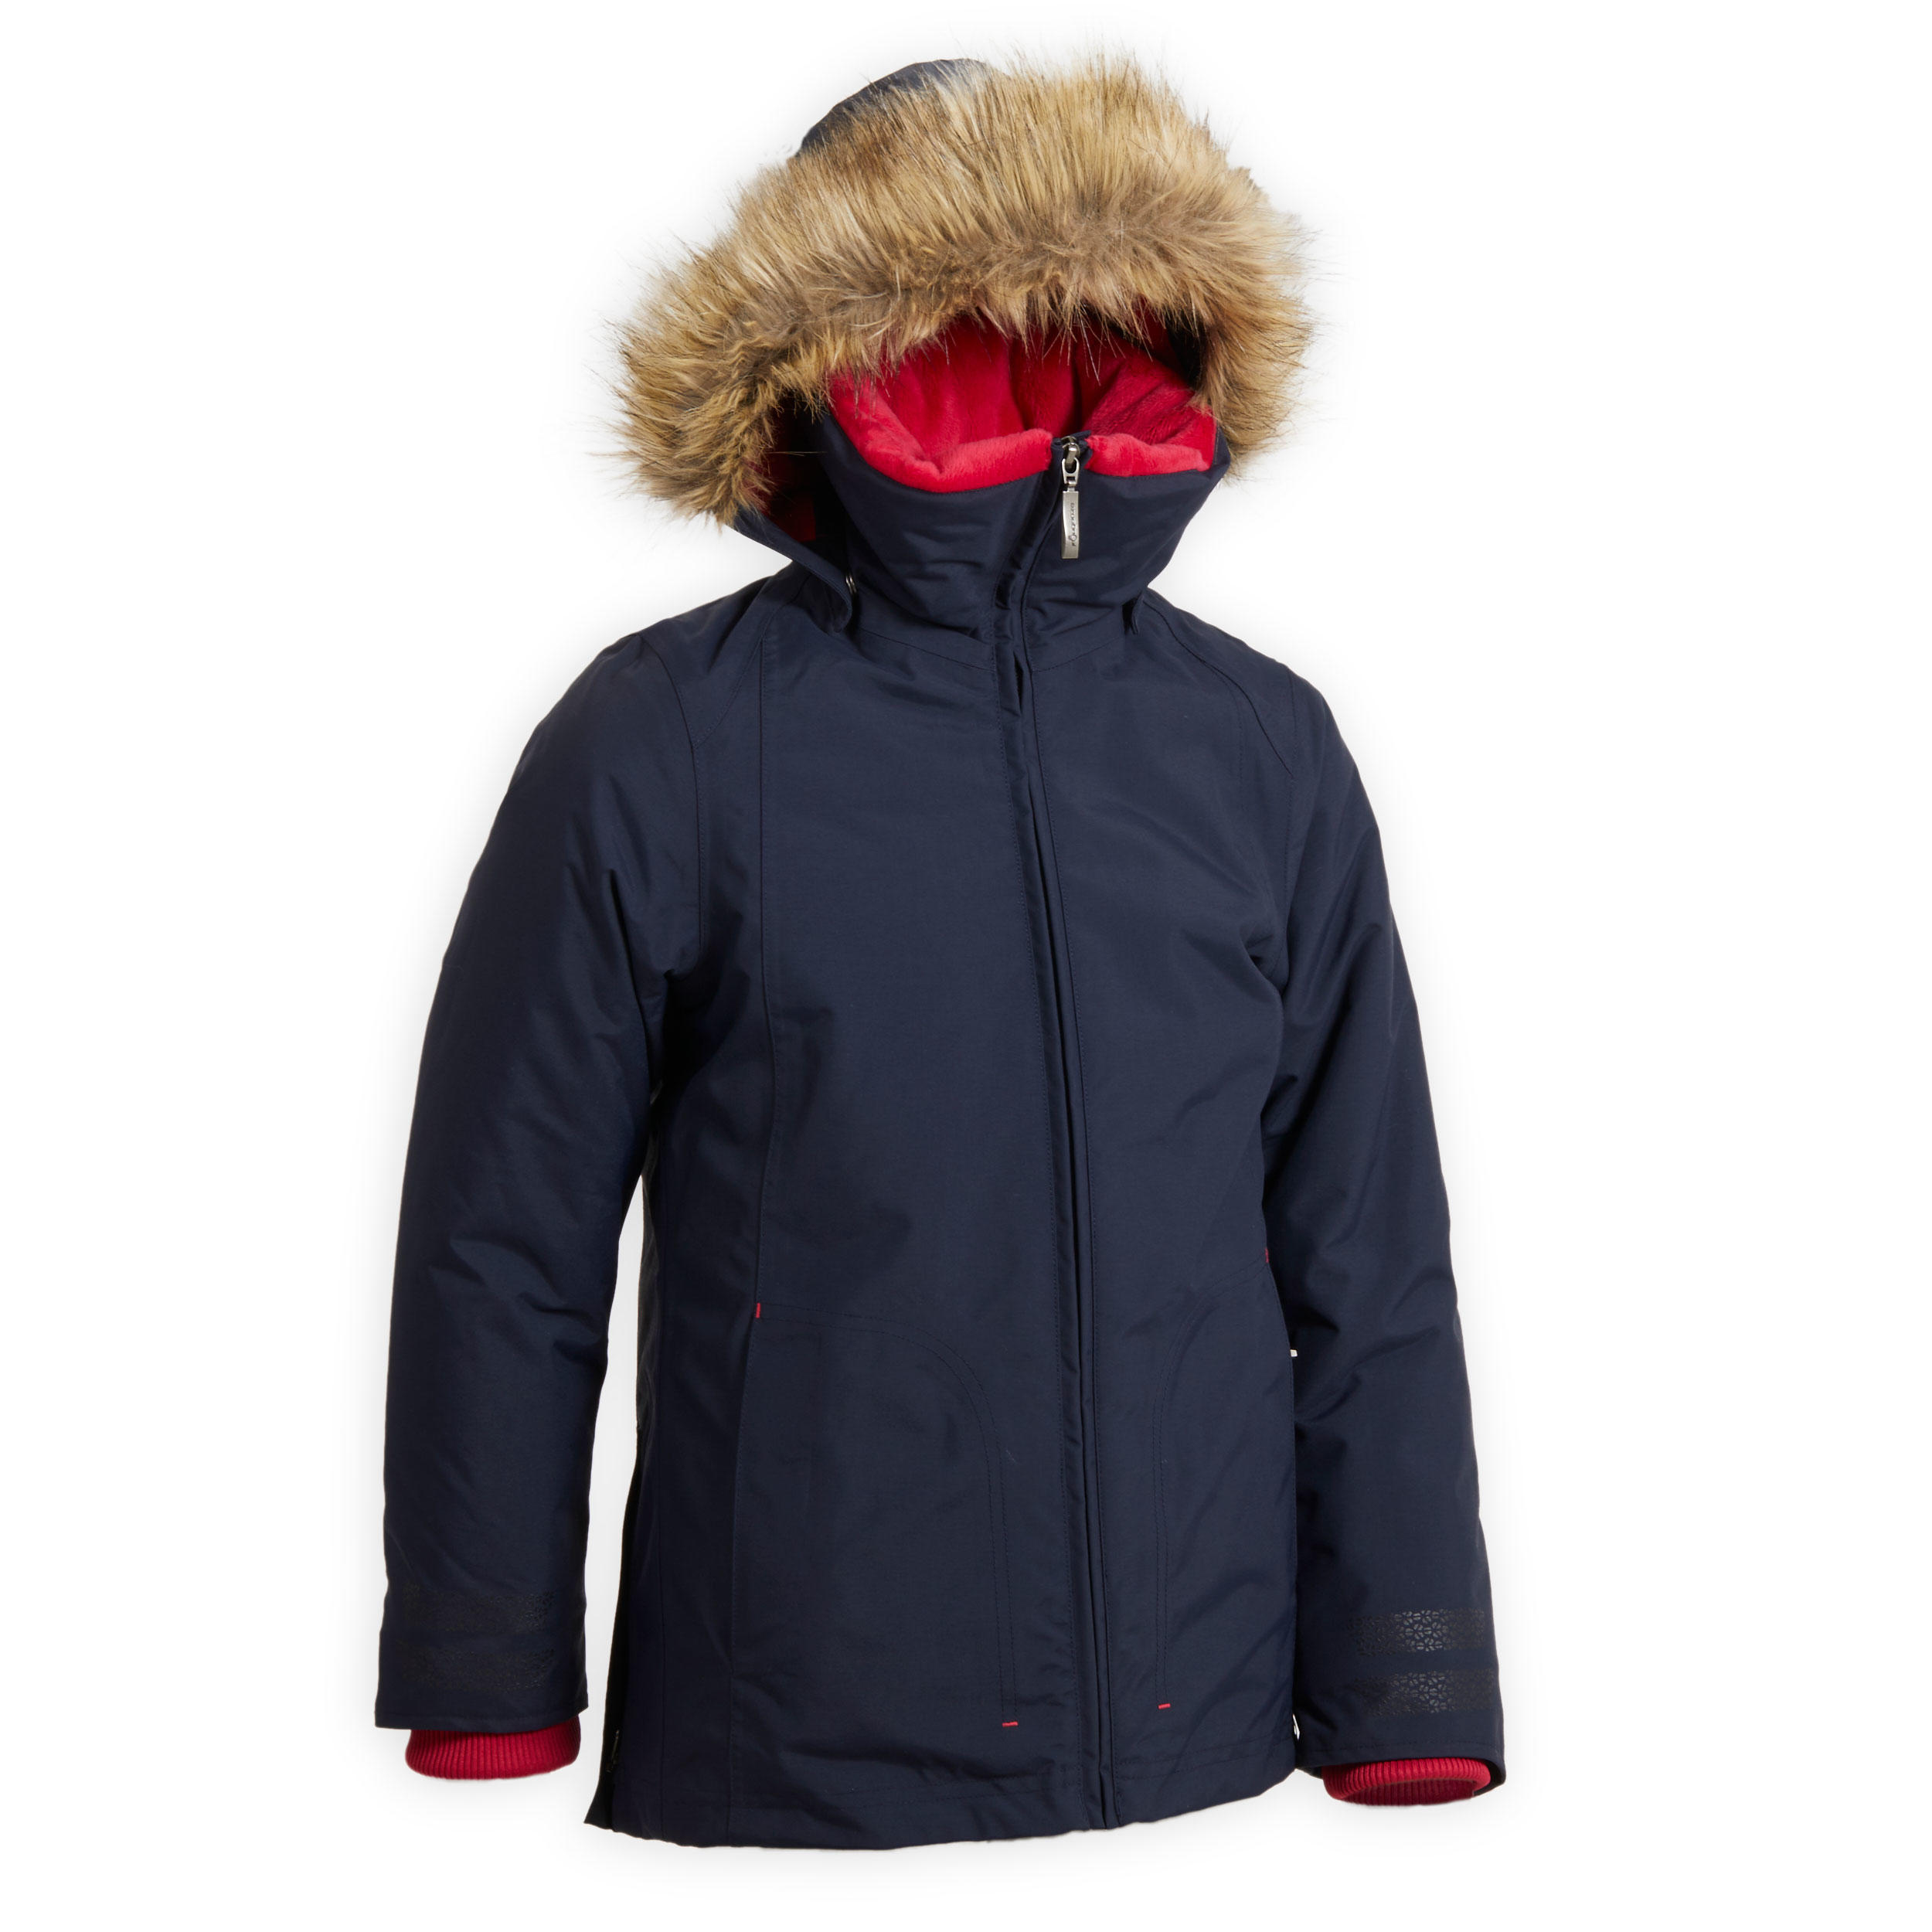 Jachetă Parka 500 WARM Copii